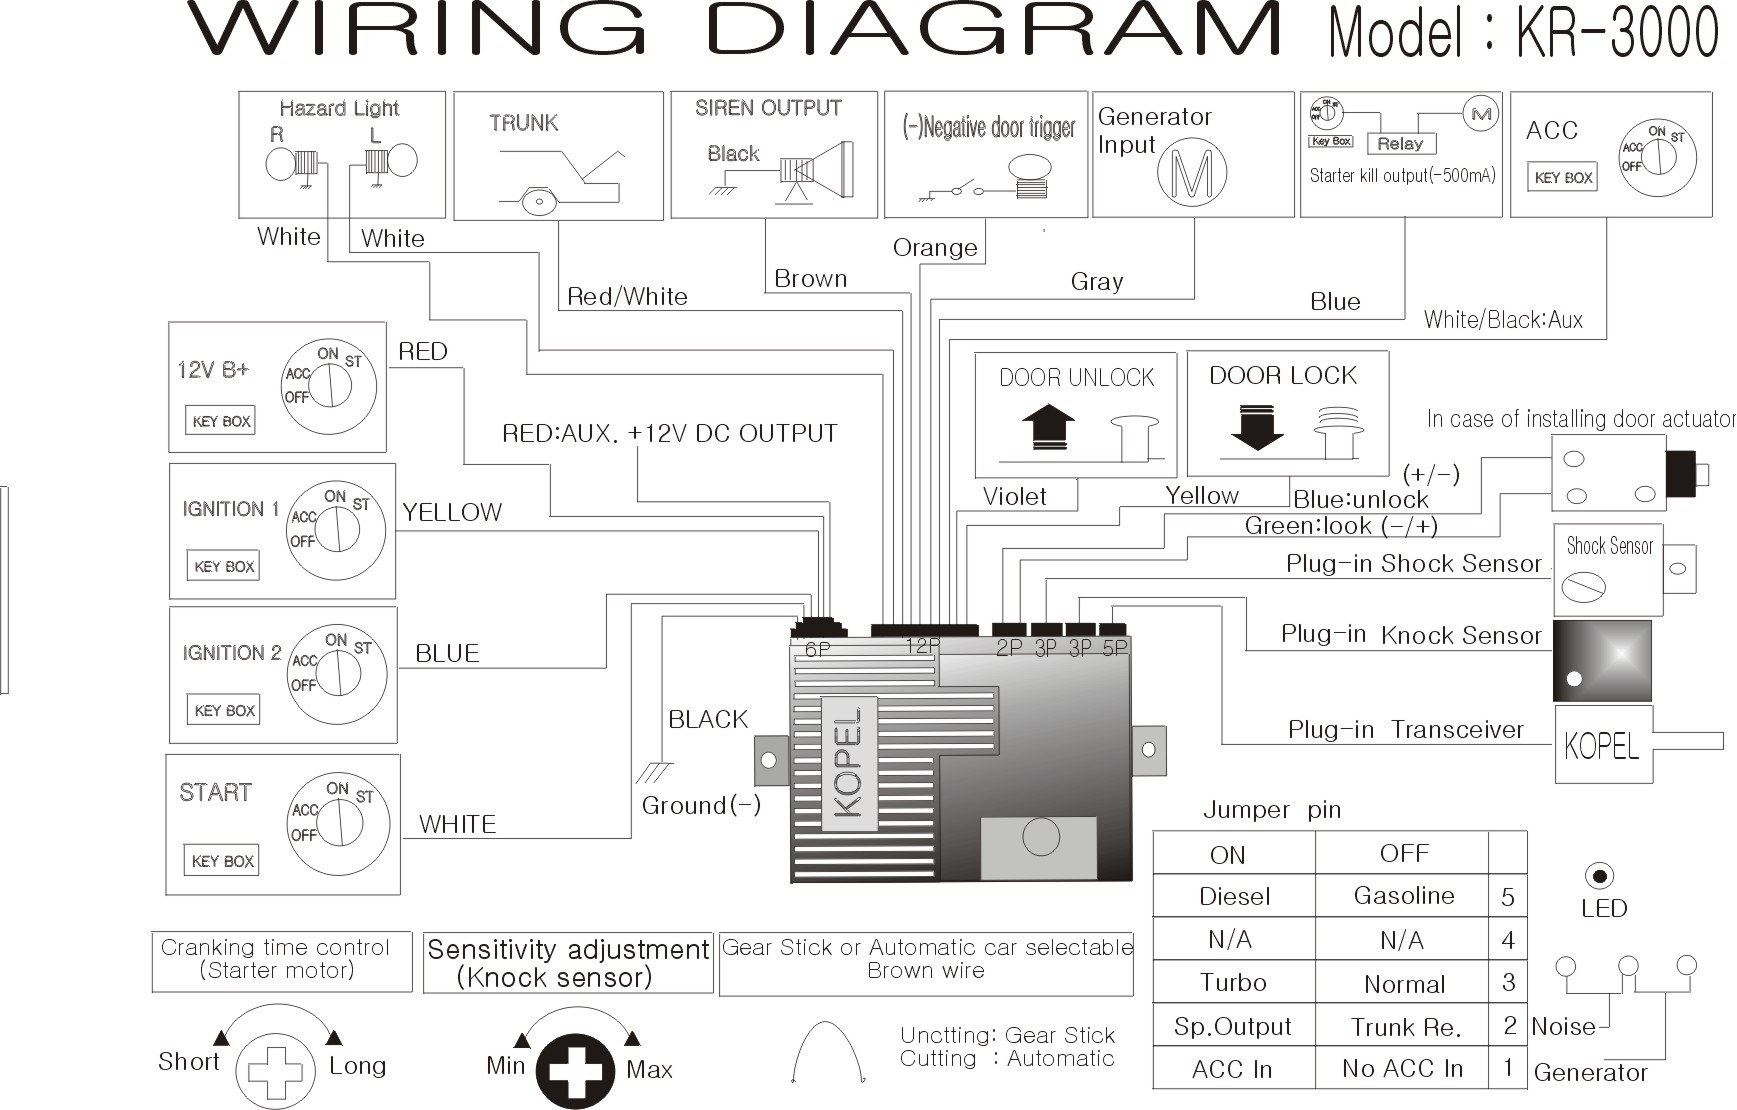 Evs car alarm wiring diagram 2 data wiring diagrams diagram for car mobilizer car electric vehicle lightweight hybrid ev rh detoxicrecenze com viper car alarm system diagram car alarm wiring diagram asfbconference2016 Images